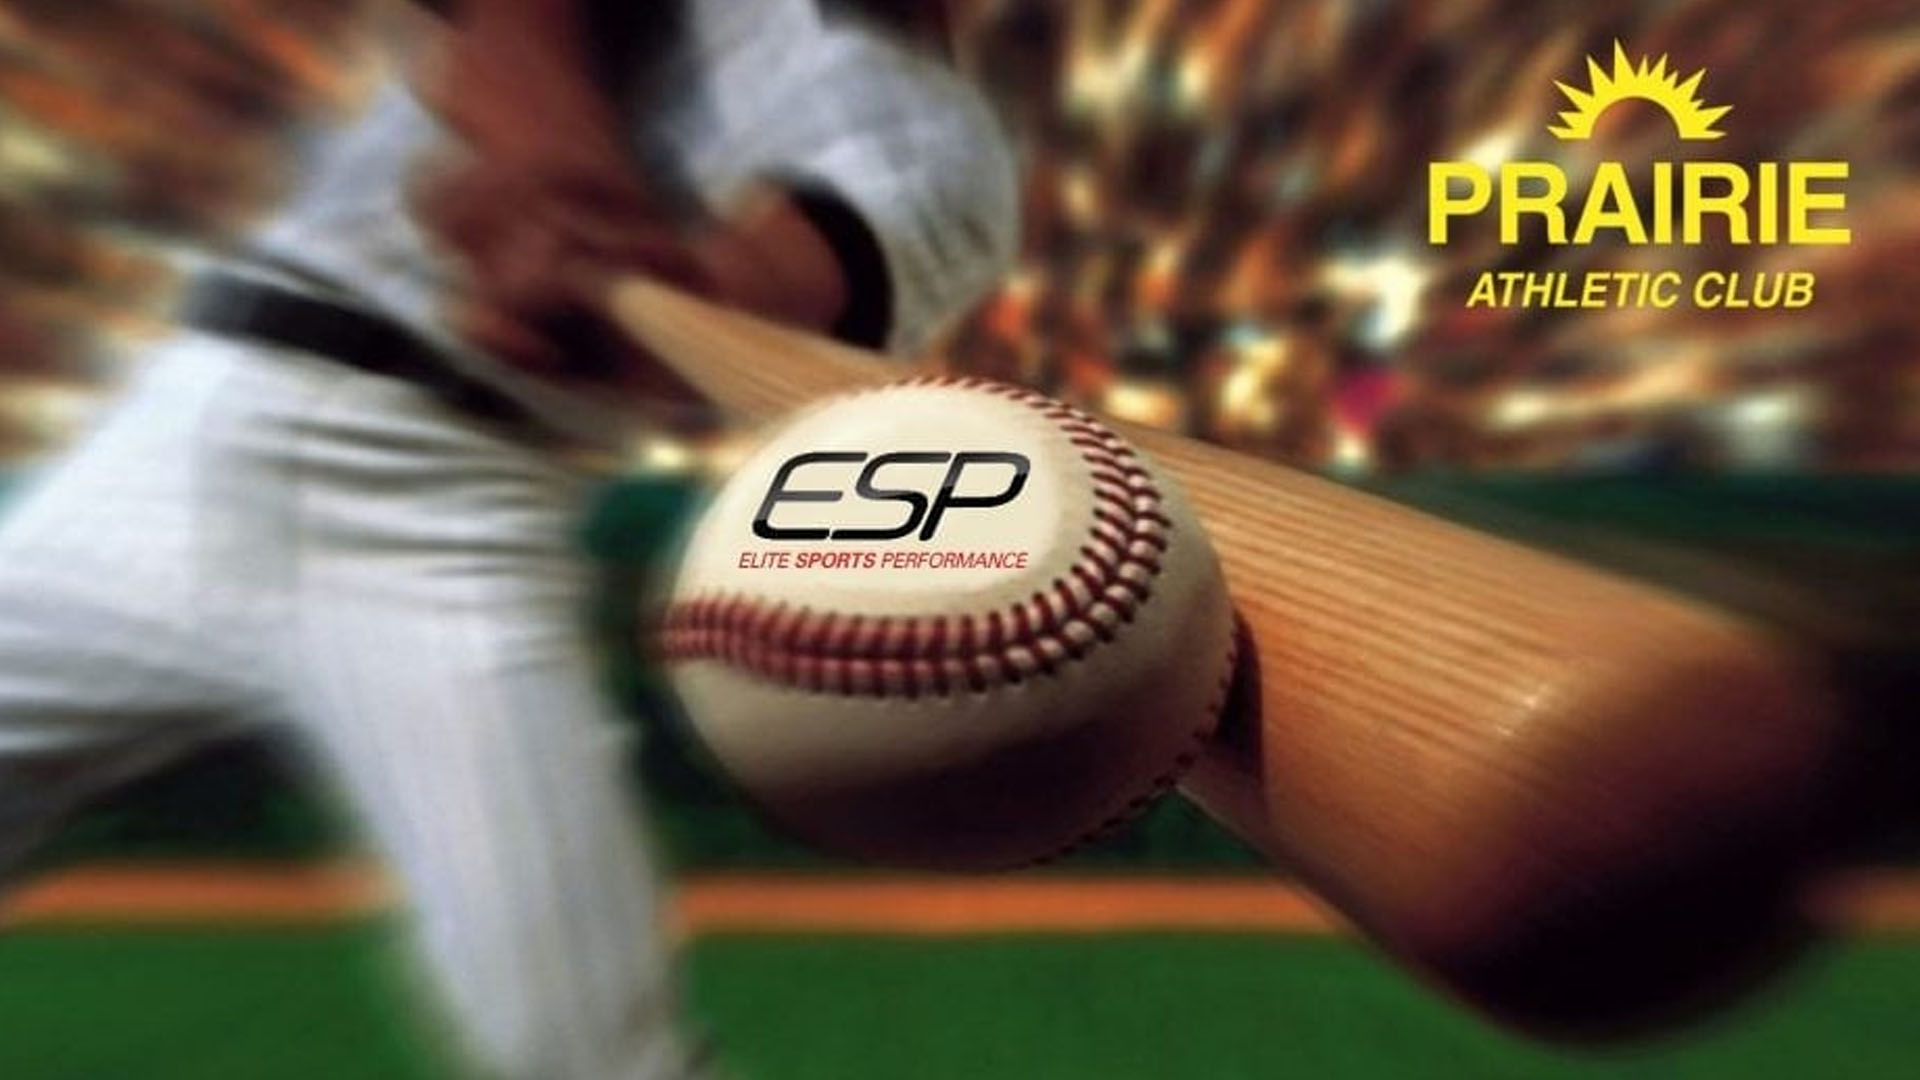 Prairie-Athletic-Club-ESP-Elite-Sports-Performance-8